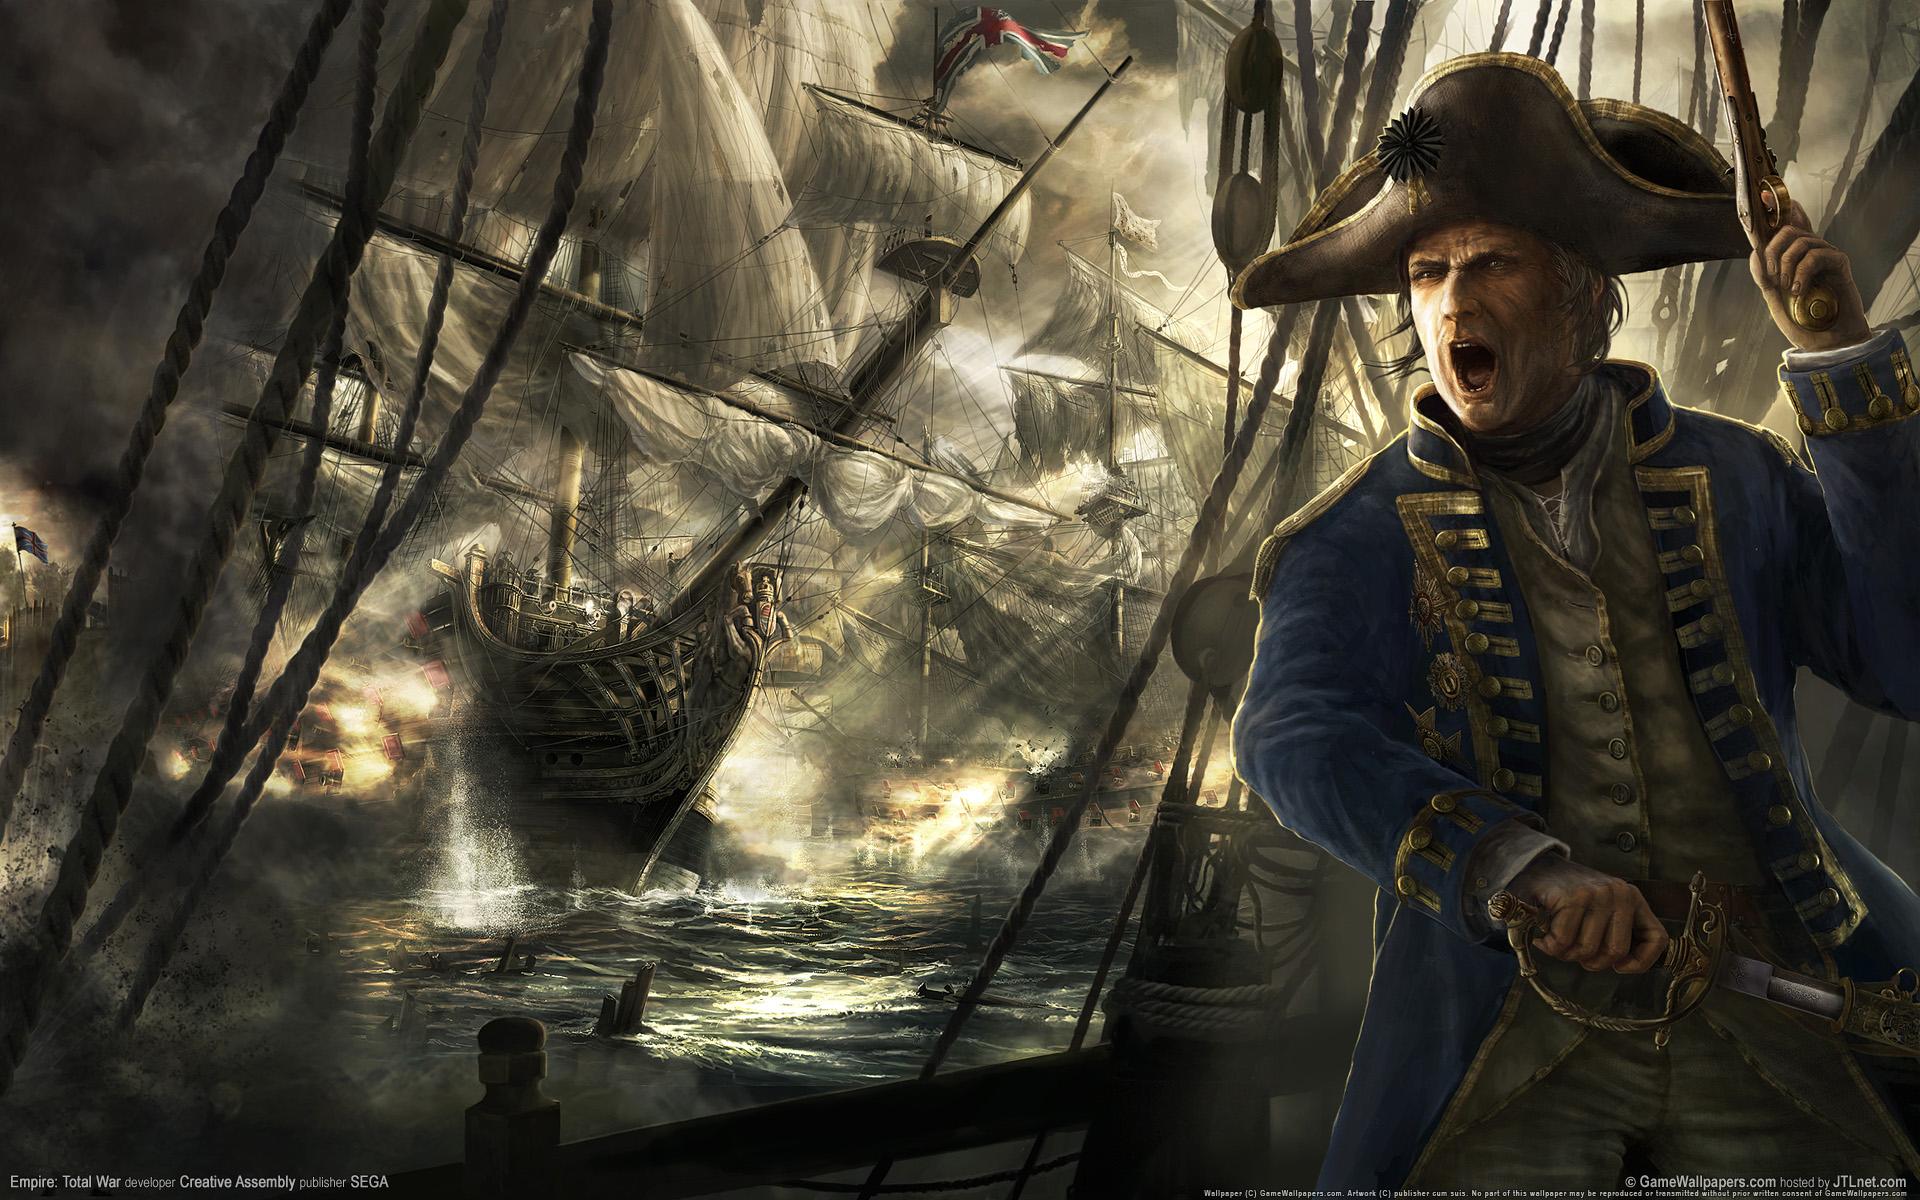 napoleon total war download free full game